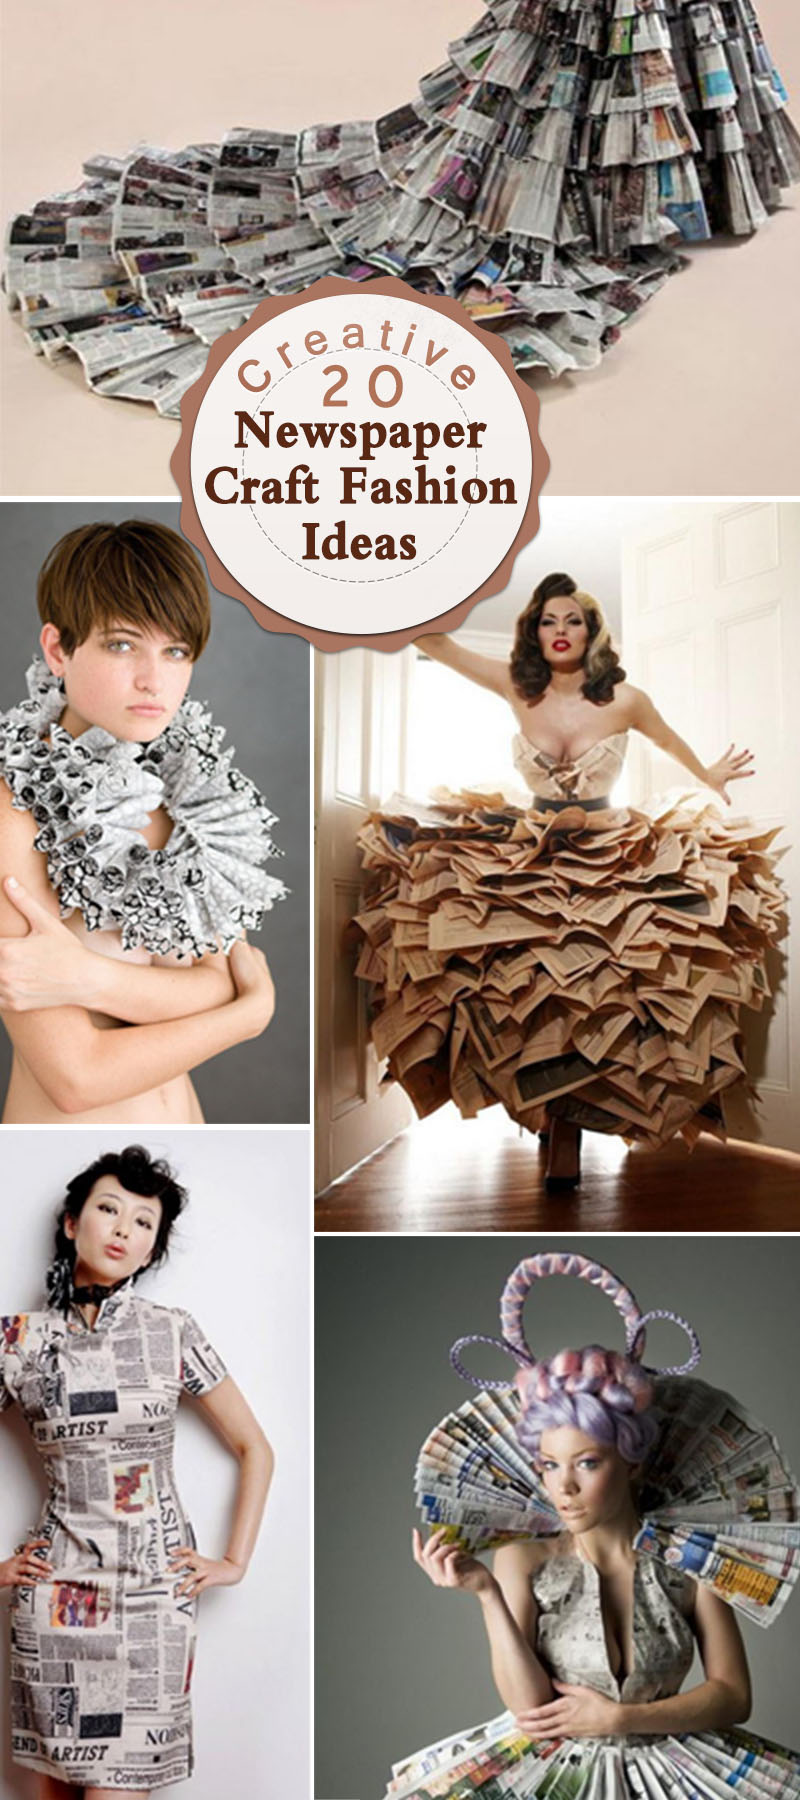 Creative Newspaper Craft Fashion Ideas!